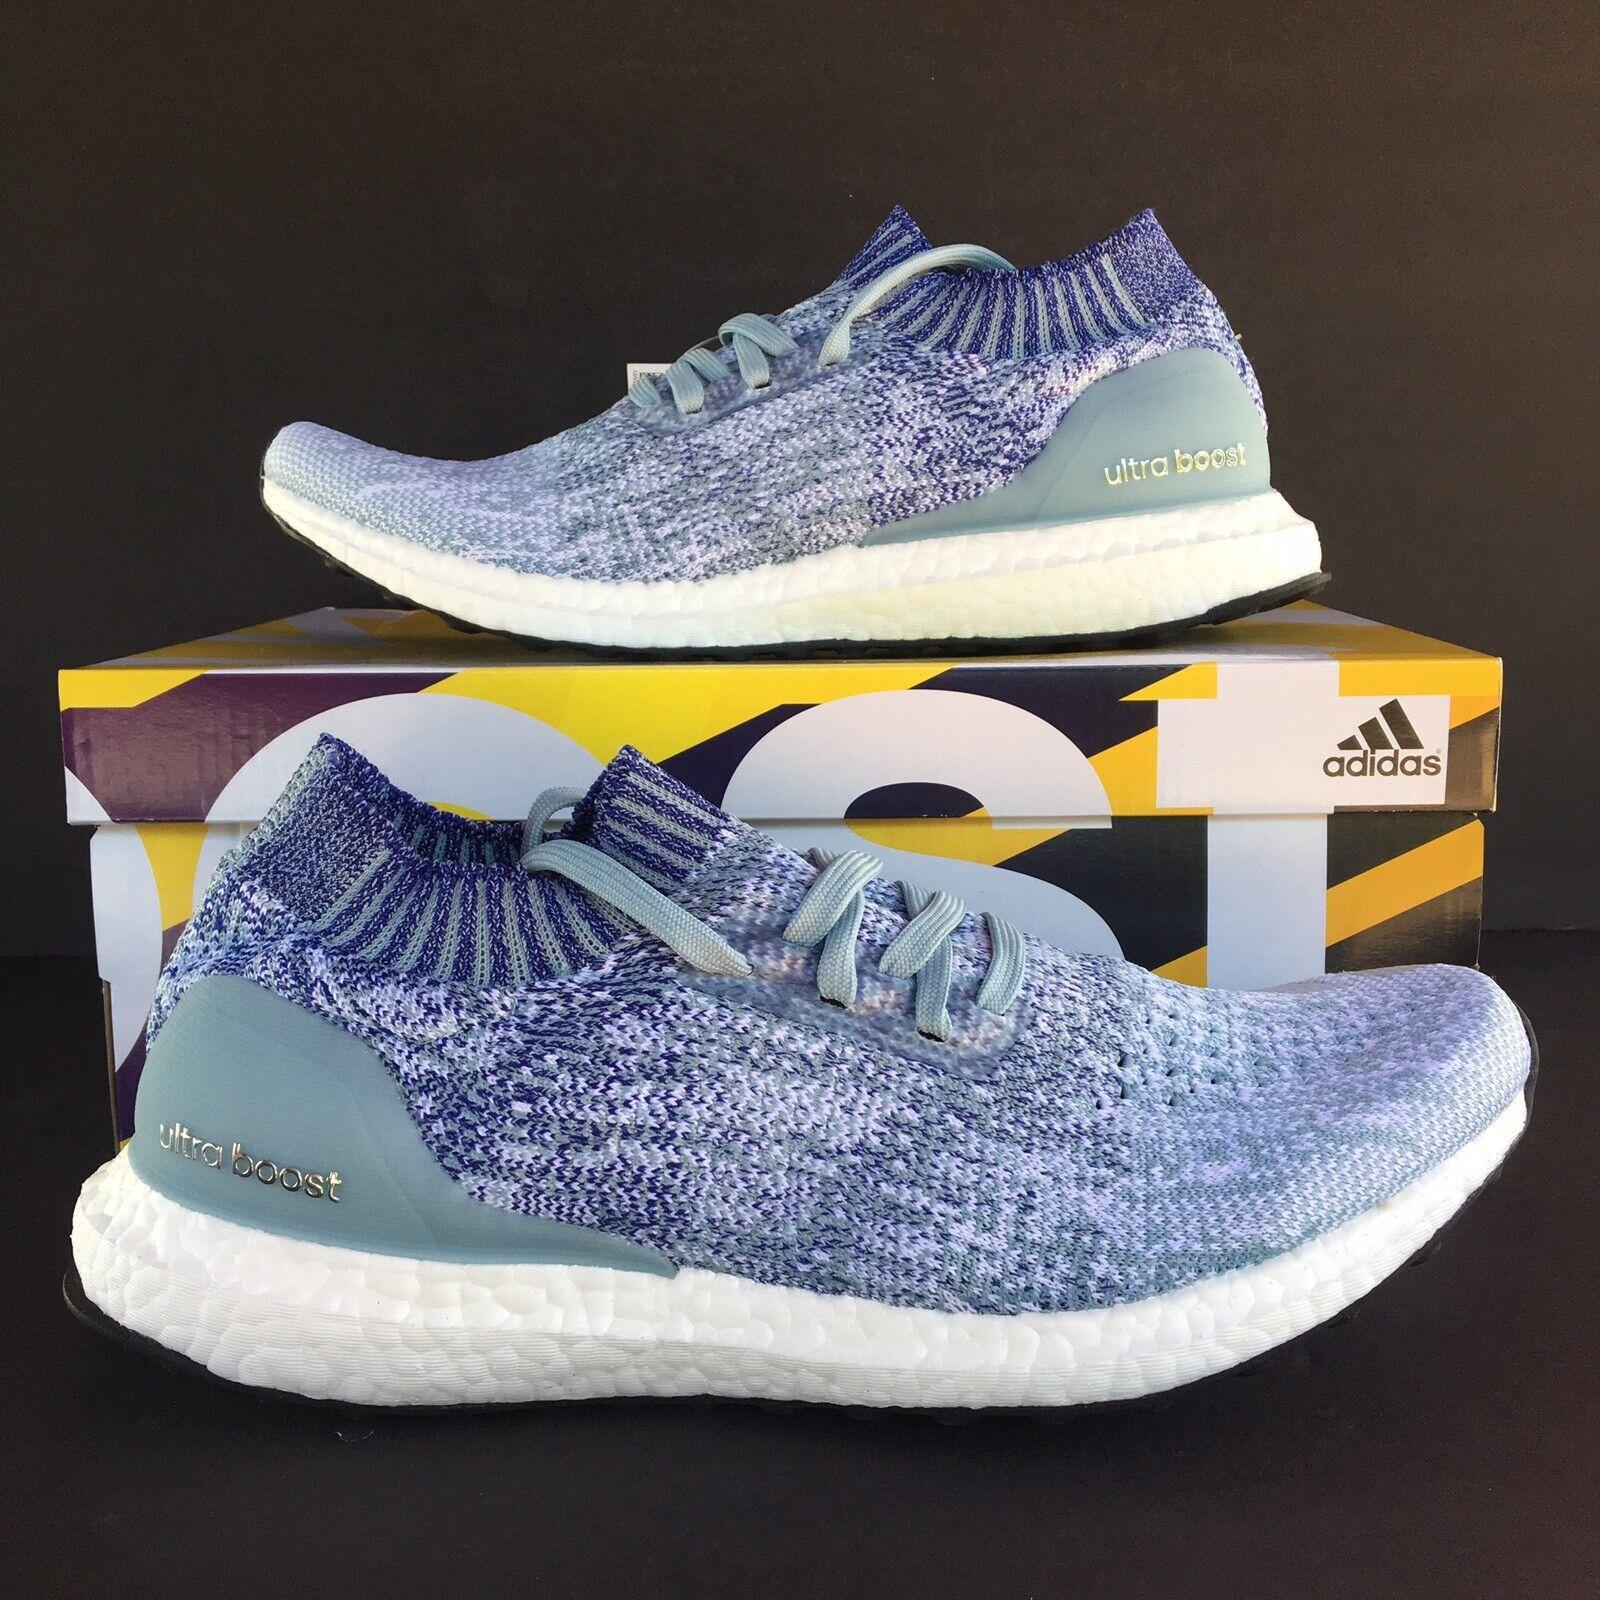 Adidas Ultra Boost Uncaged Herren Größe 8.5 Laufschuhe Aschgrau Blau Rot B37693